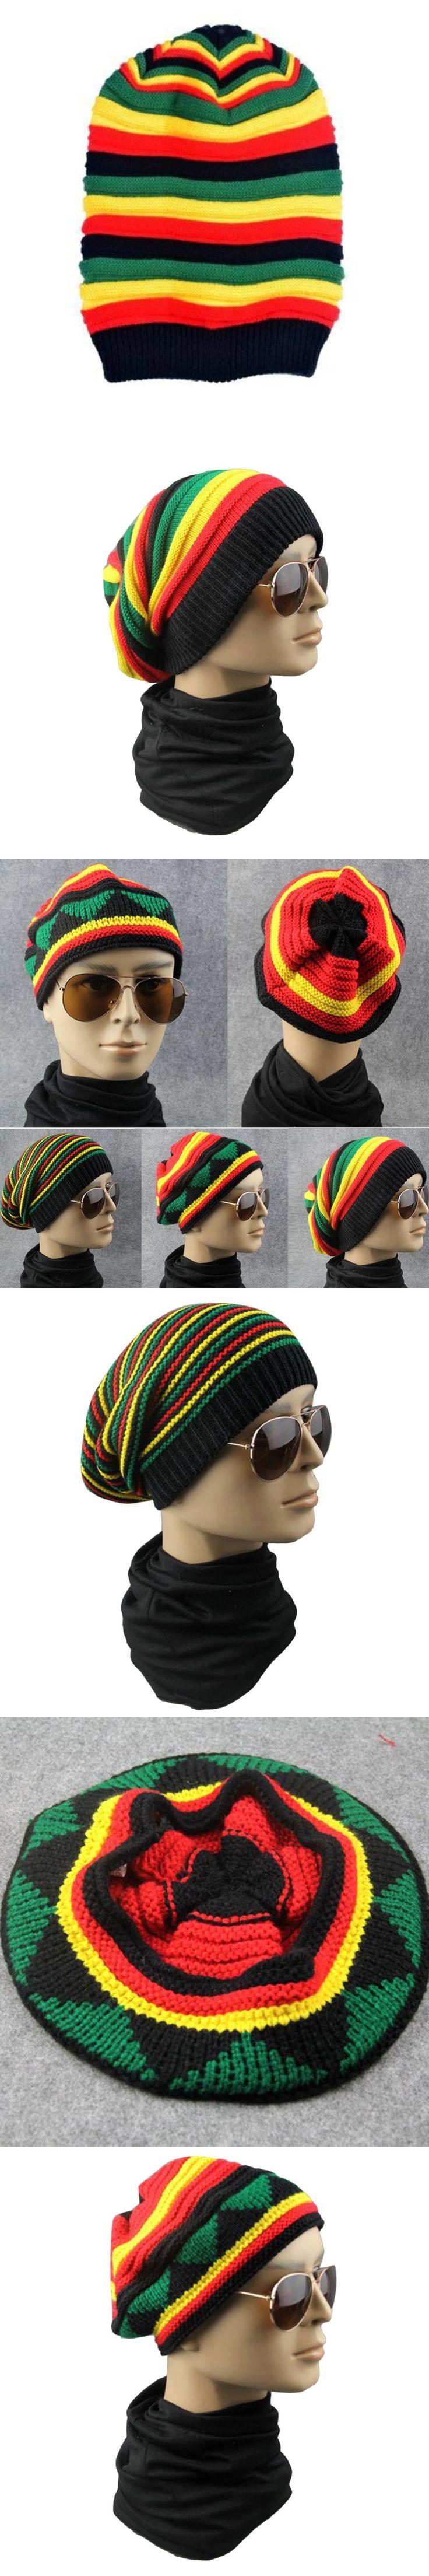 Winter Hip Hop Bob Jamaican cap Rasta Reggae Hat Multi-colour Striped Beanie Caps Hats For Men Women fashion new style Bonnet